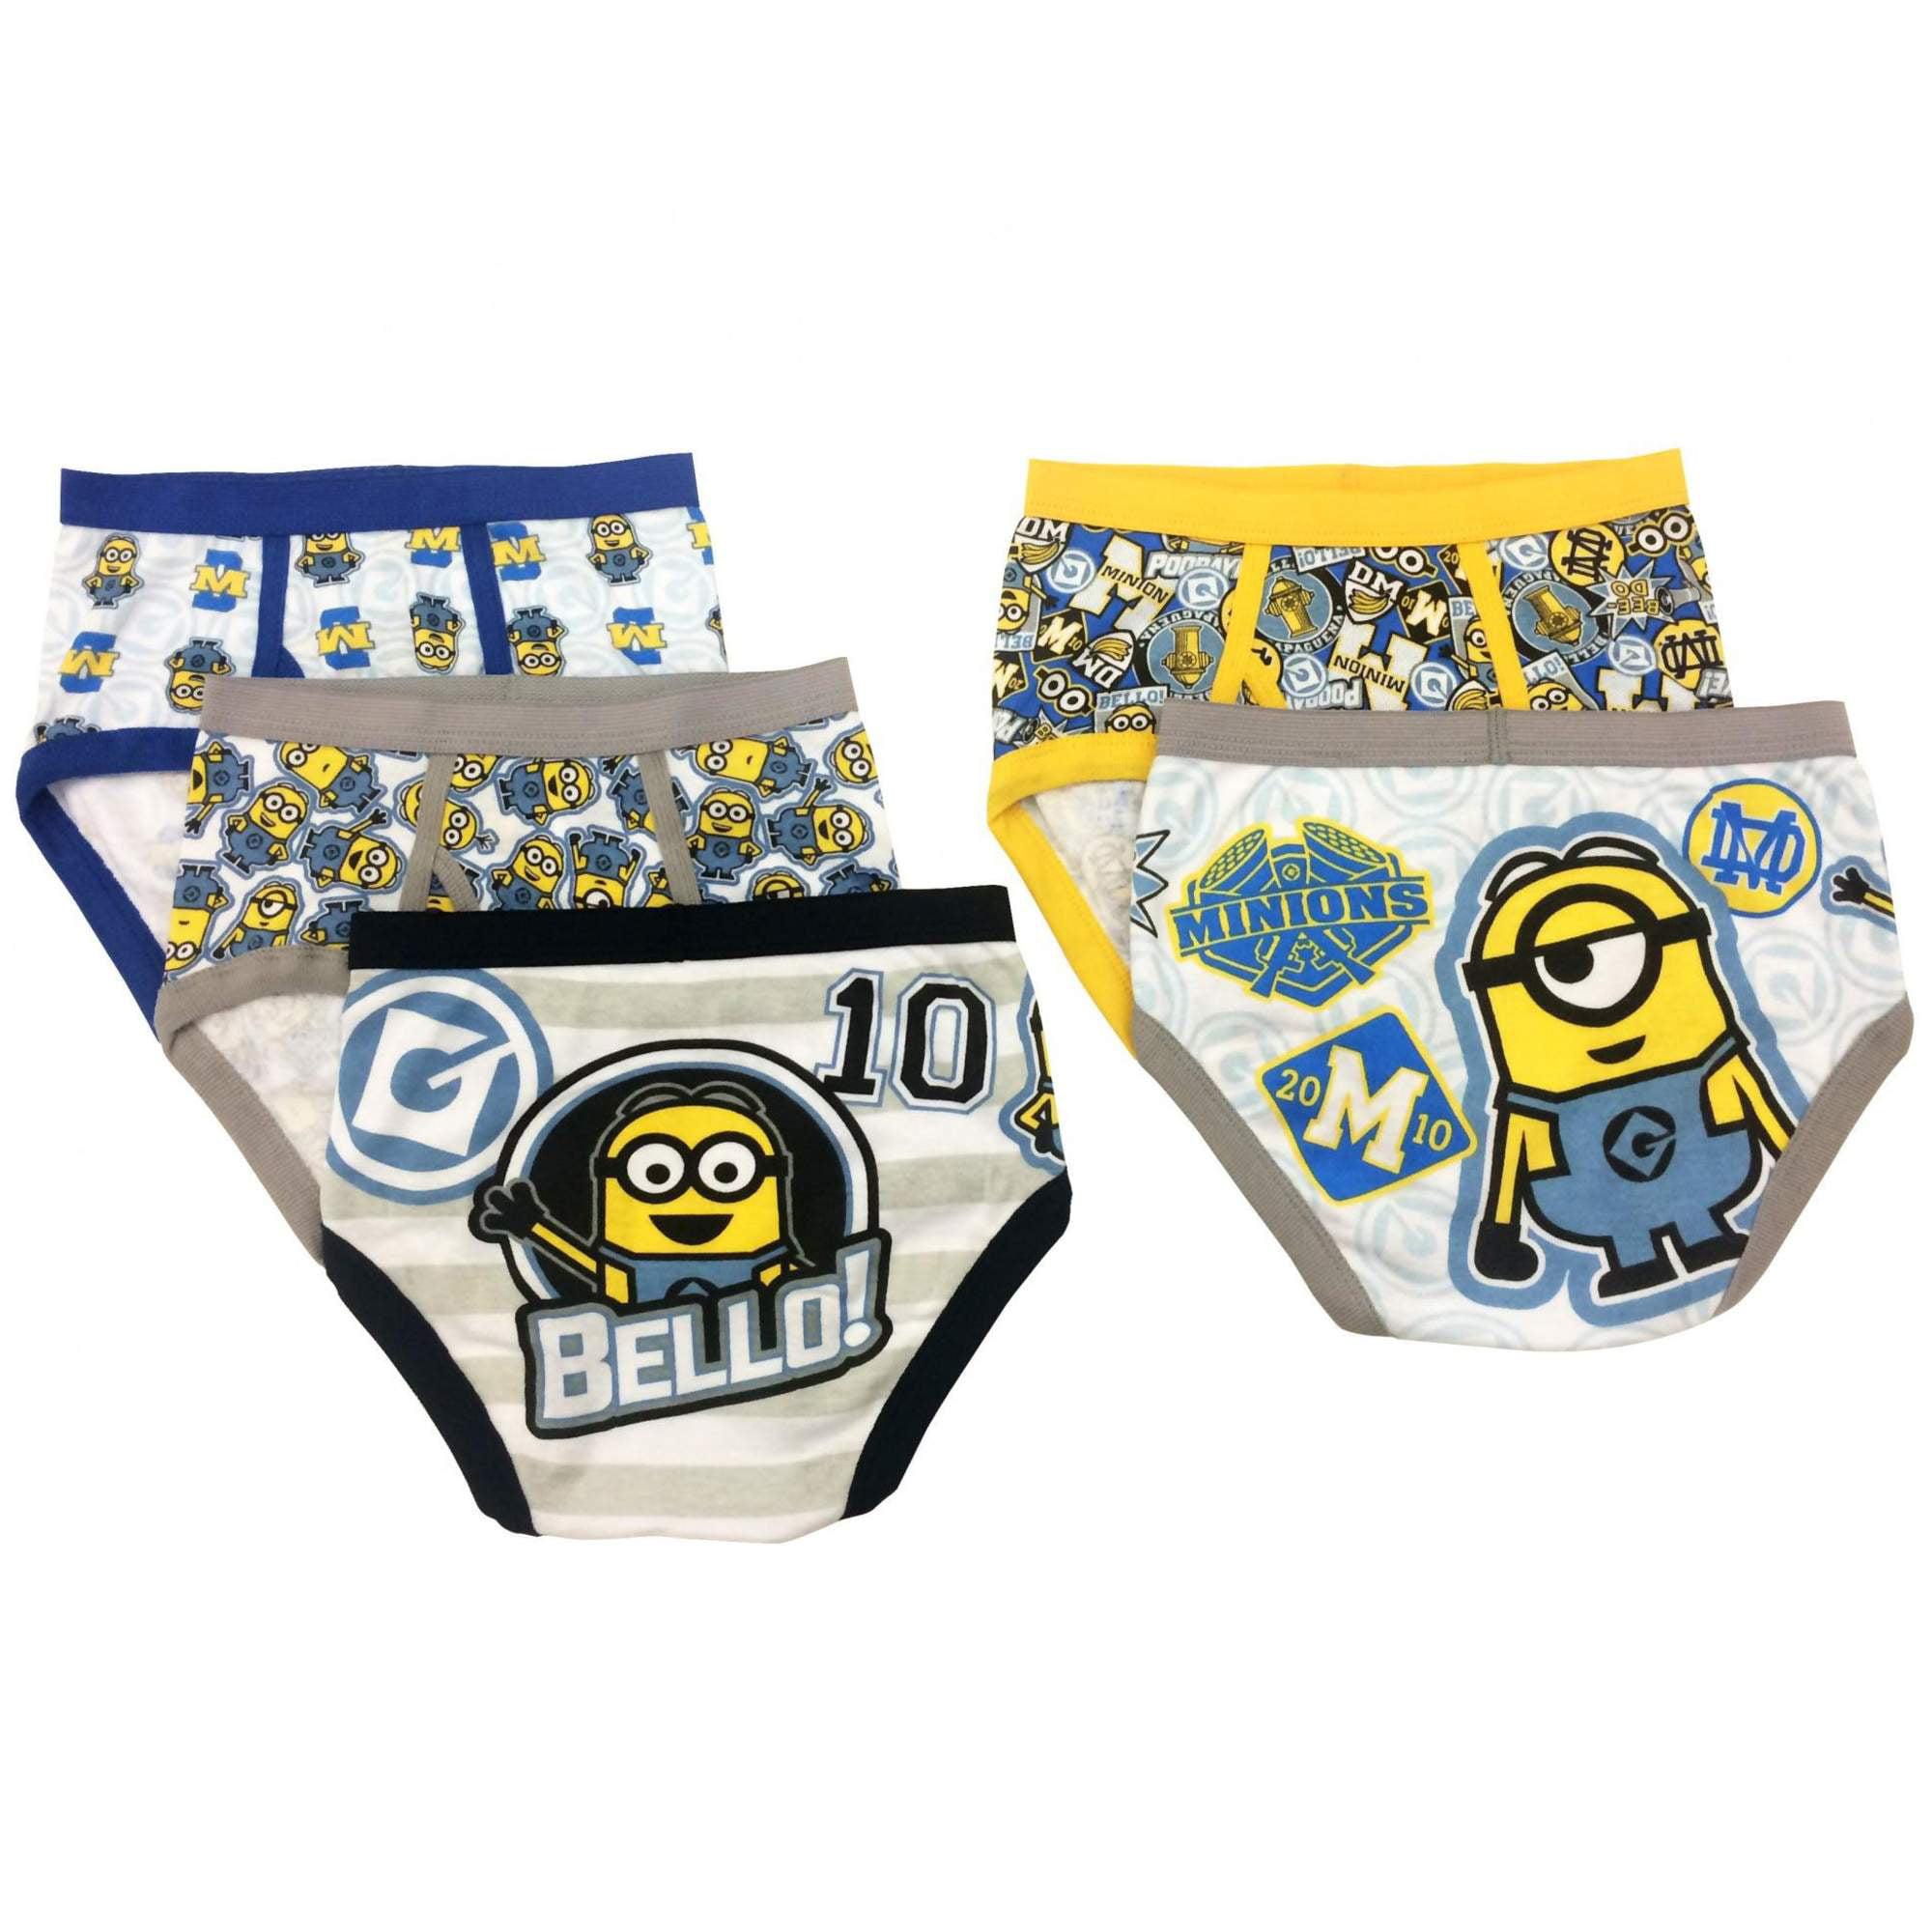 Minion in panties Despicable Me Despicable Me Minions Boys Underwear 5 Pack Briefs Little Boys Big Boys Walmart Com Walmart Com